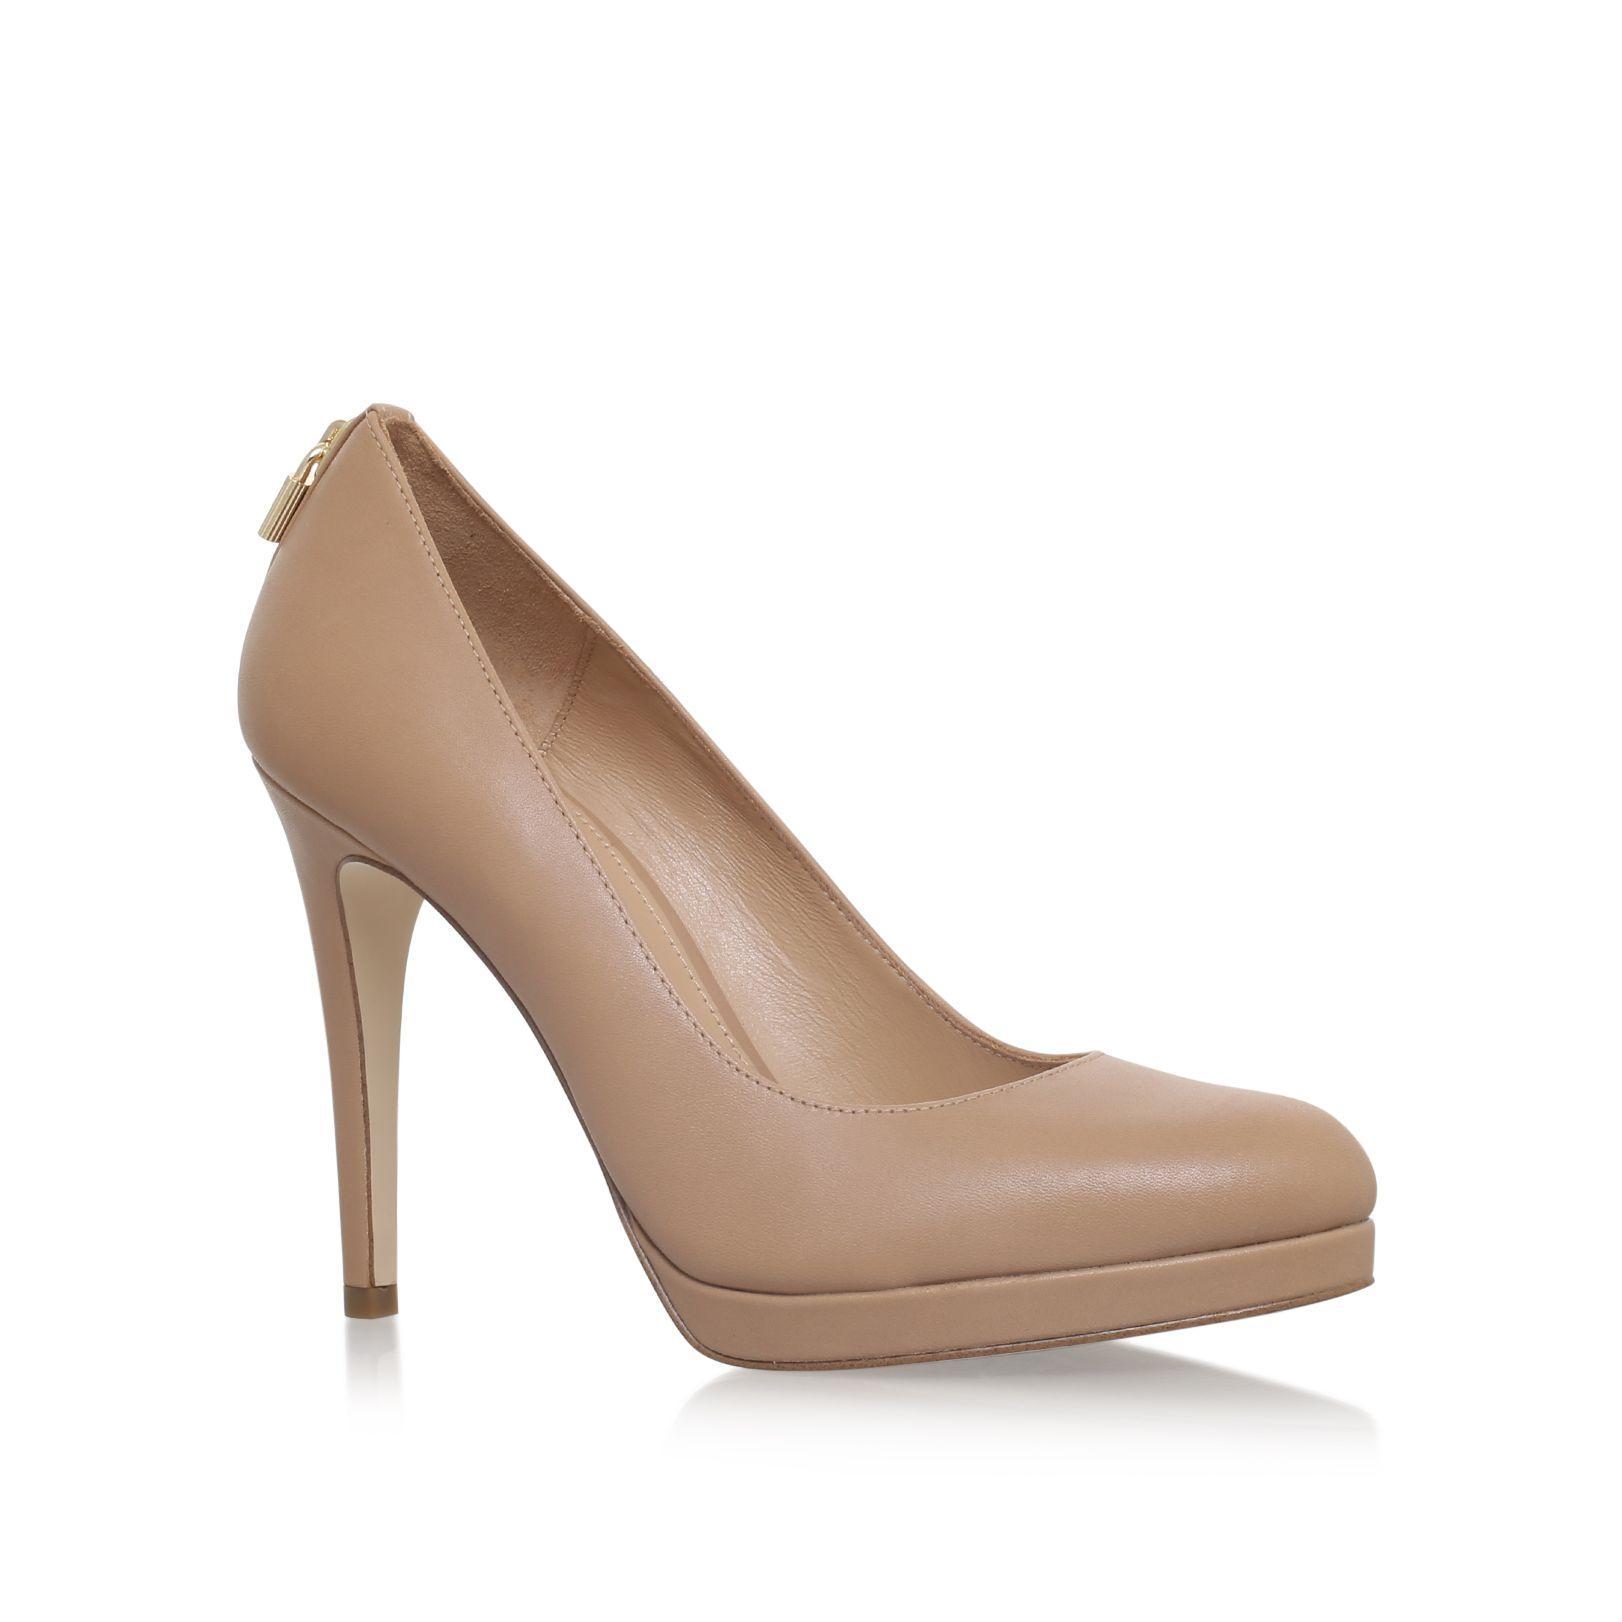 michael kors antionette pump court shoes in natural lyst. Black Bedroom Furniture Sets. Home Design Ideas